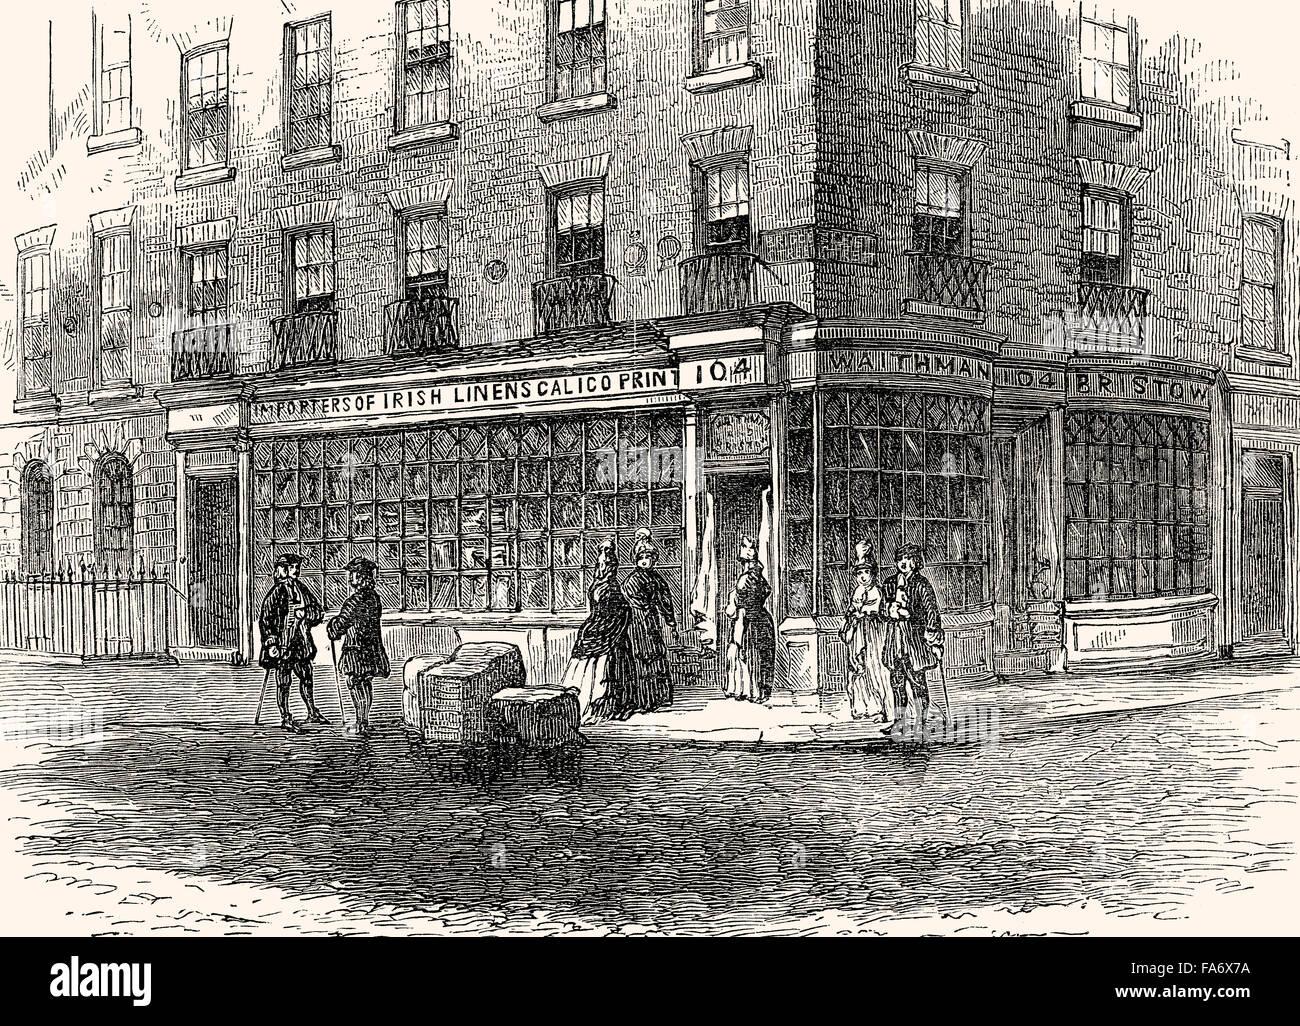 Waithman's shop in Fleet Street; London, Alderman Robert Waithman, 1764-1833, Politician and Lord Mayor of London, - Stock Image